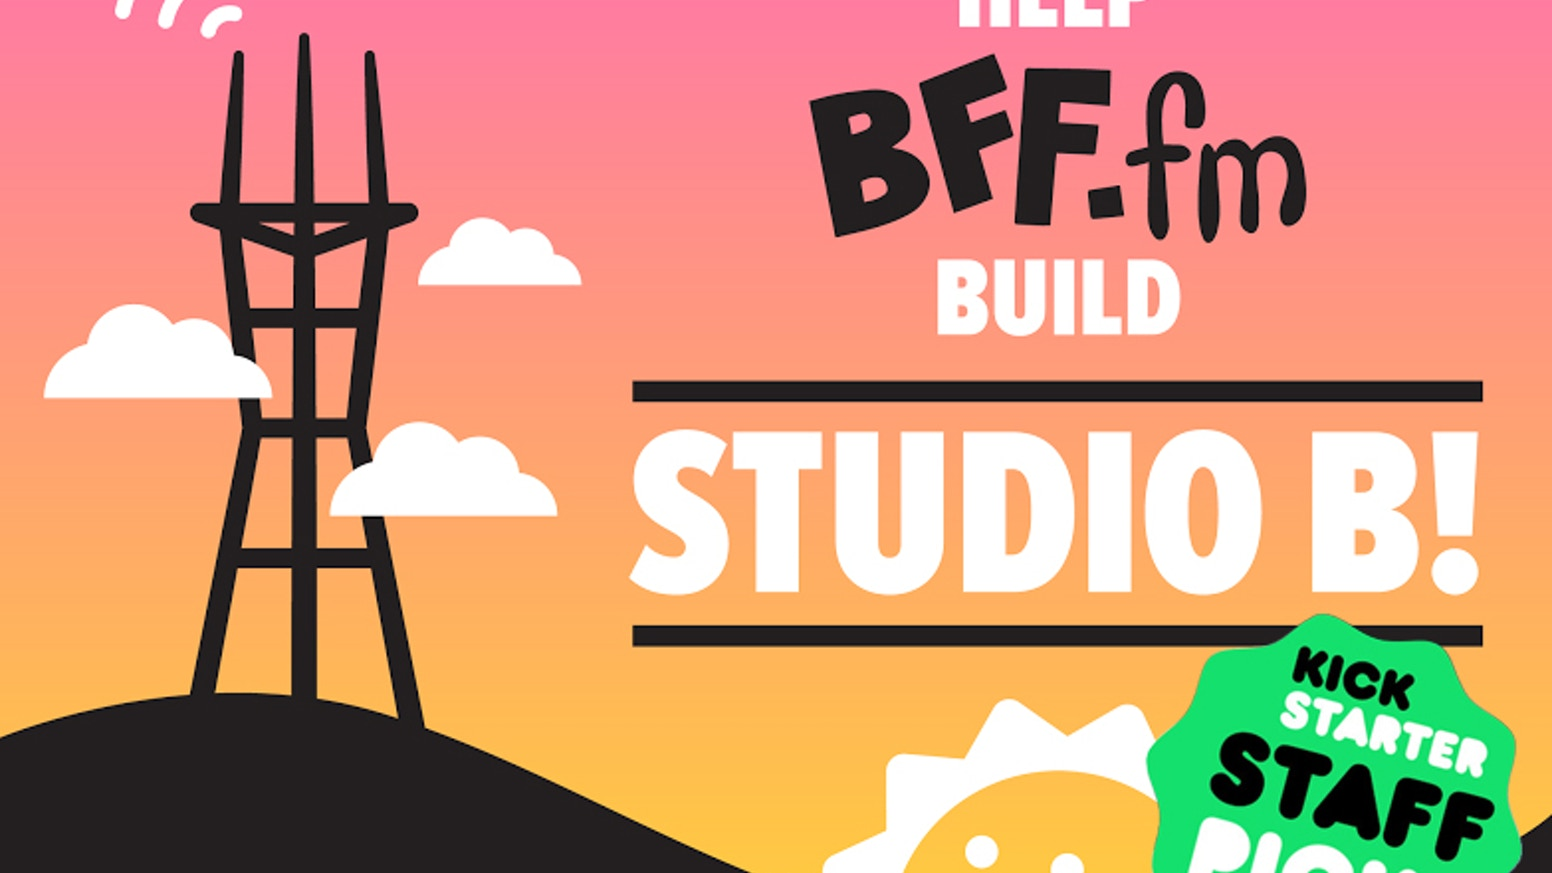 Help BFF fm, community radio in San Francisco, expand! by